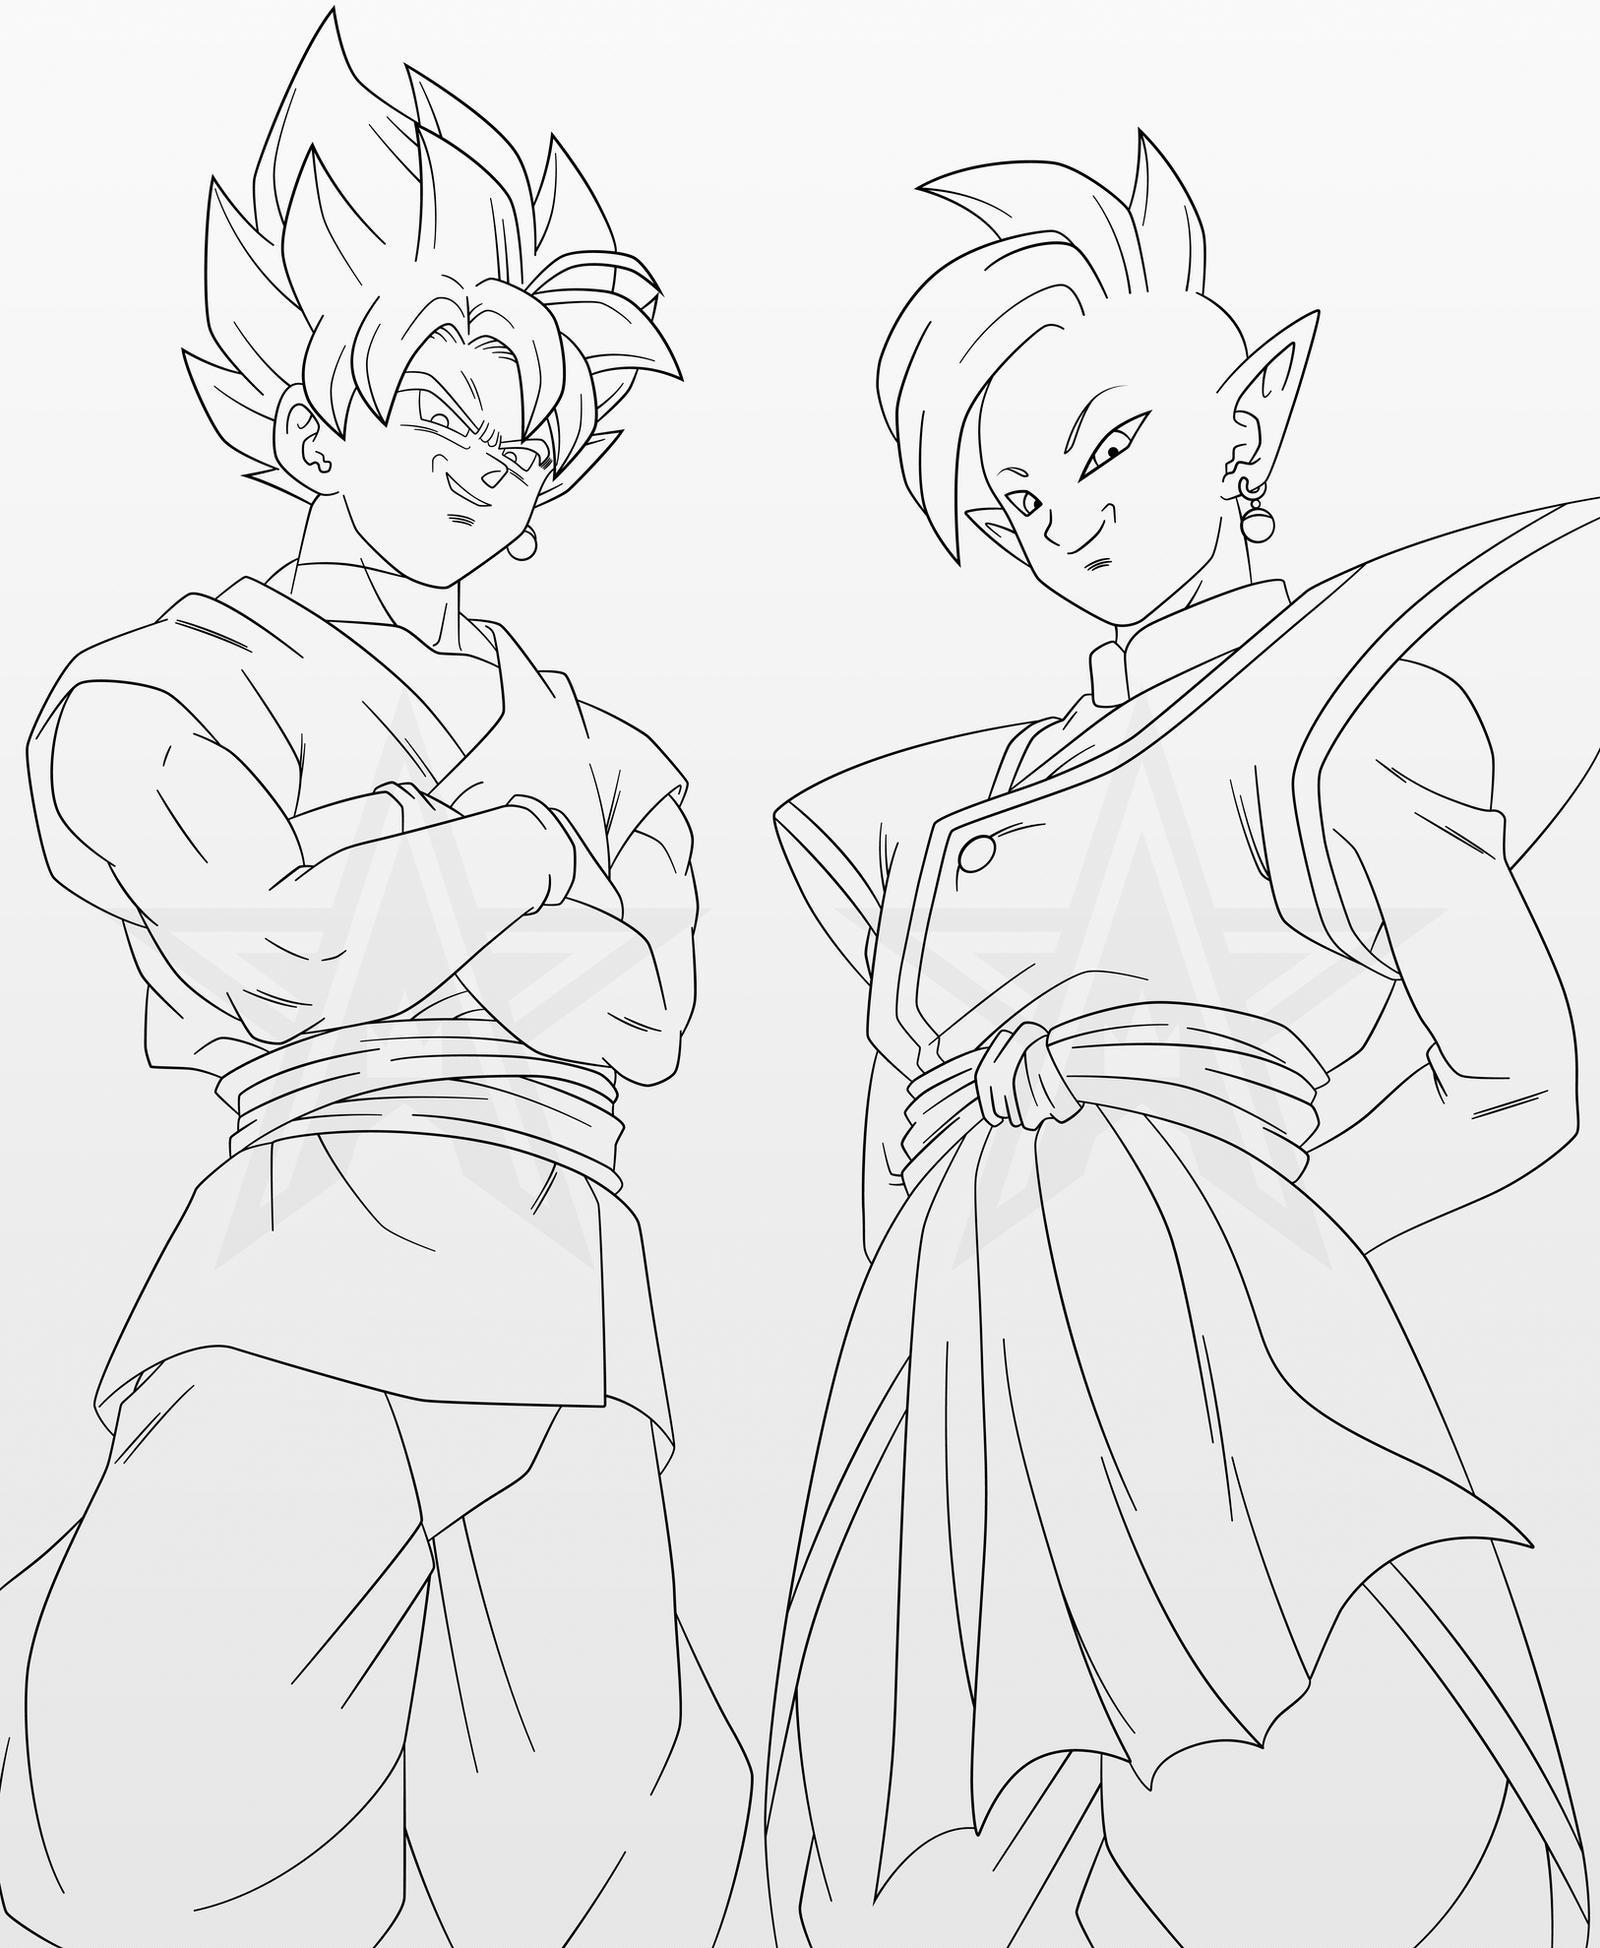 Line Art Vs Sketch : Goku black zamasu line art by aubreiprince on